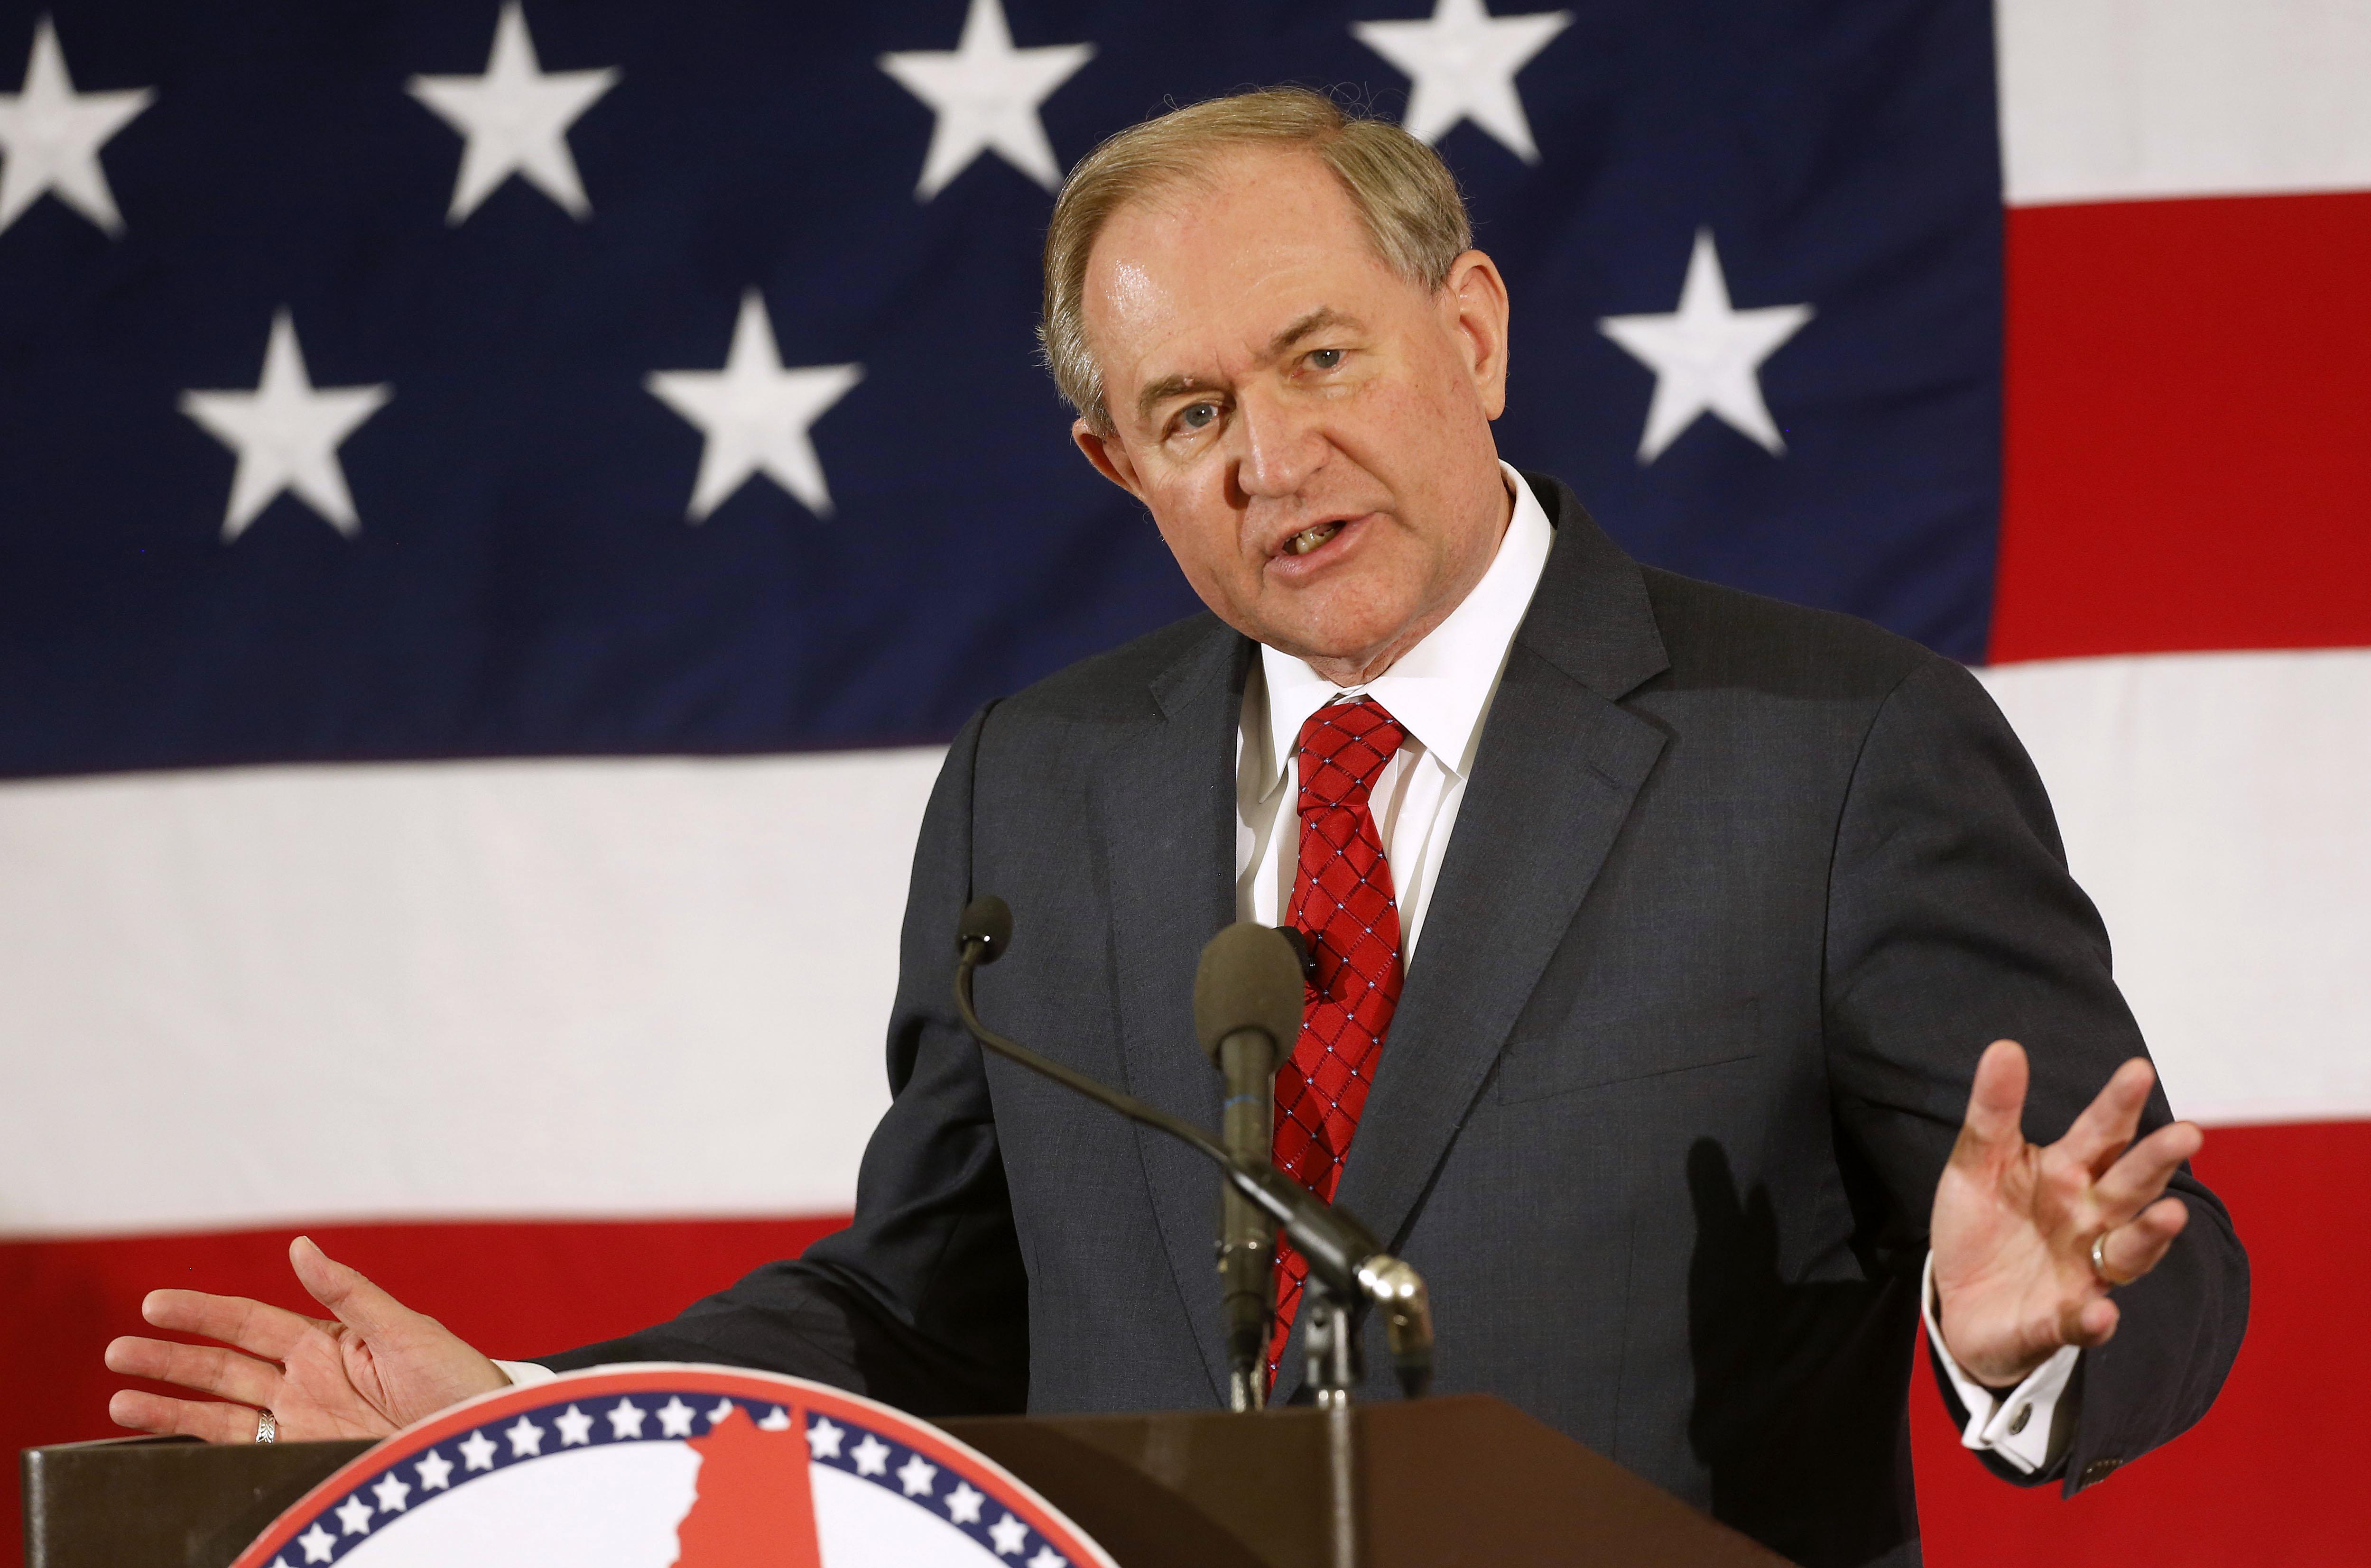 Photo: Former Virginia Gov. Jim Gilmore (AP Image/File)